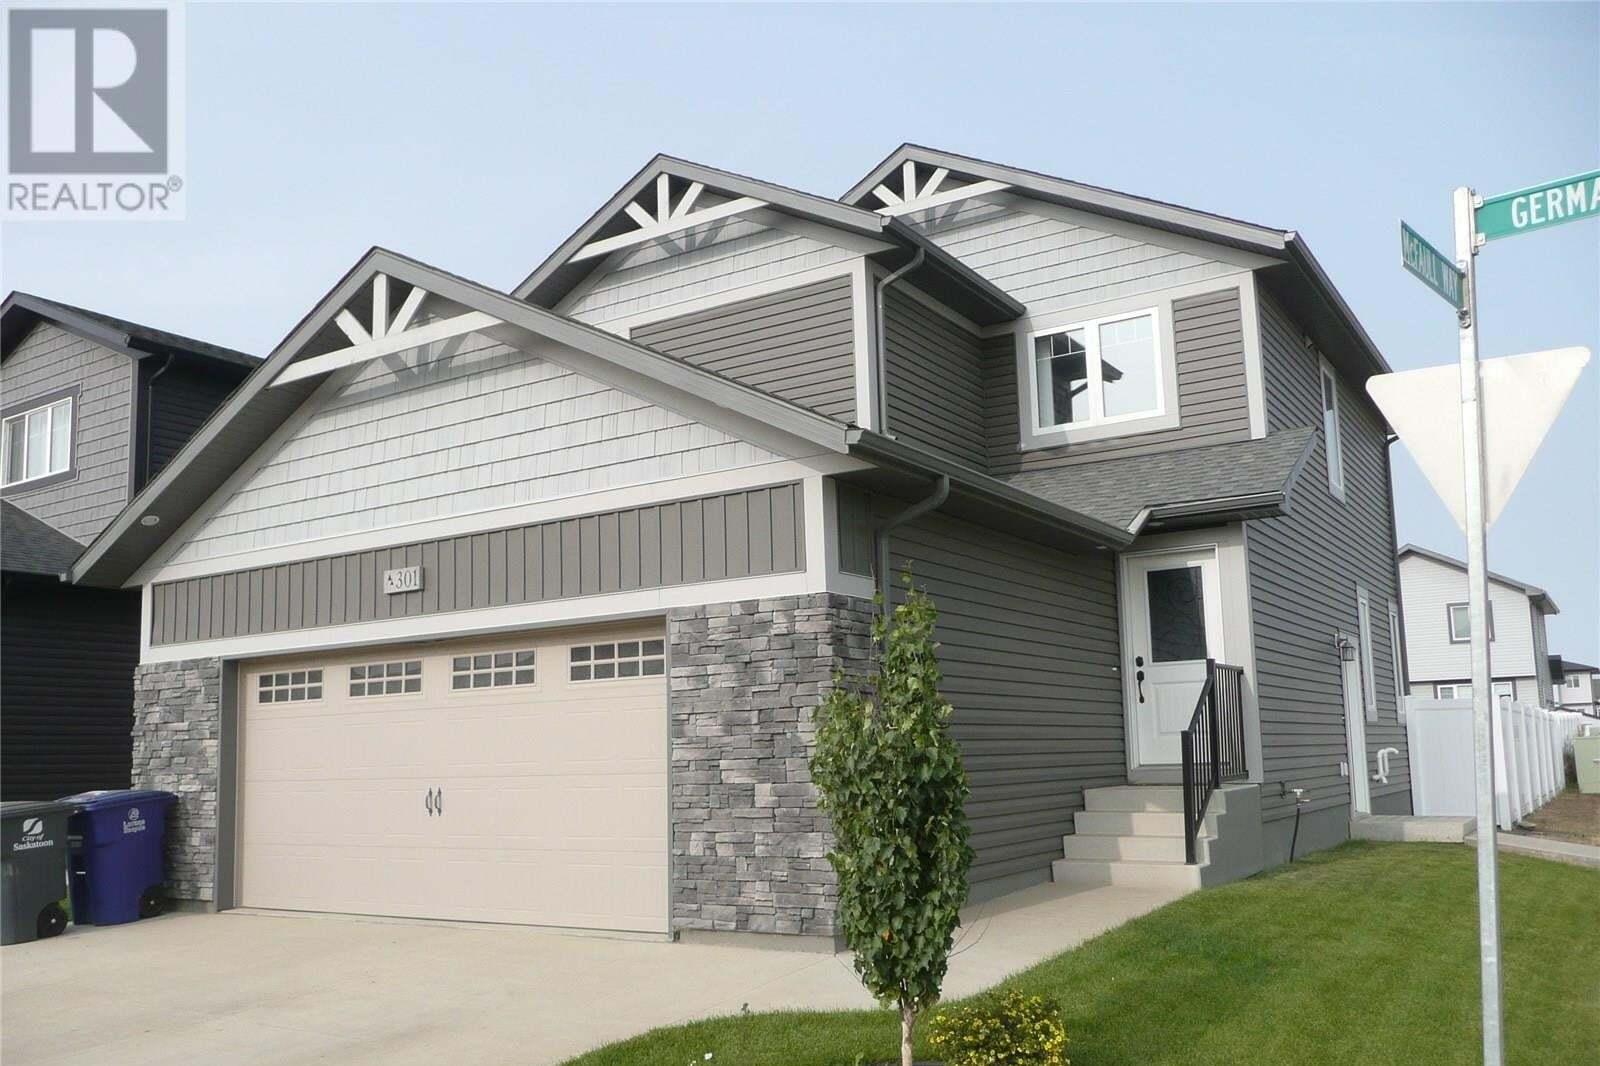 House for sale at 102 Germain Ct Saskatoon Saskatchewan - MLS: SK826788